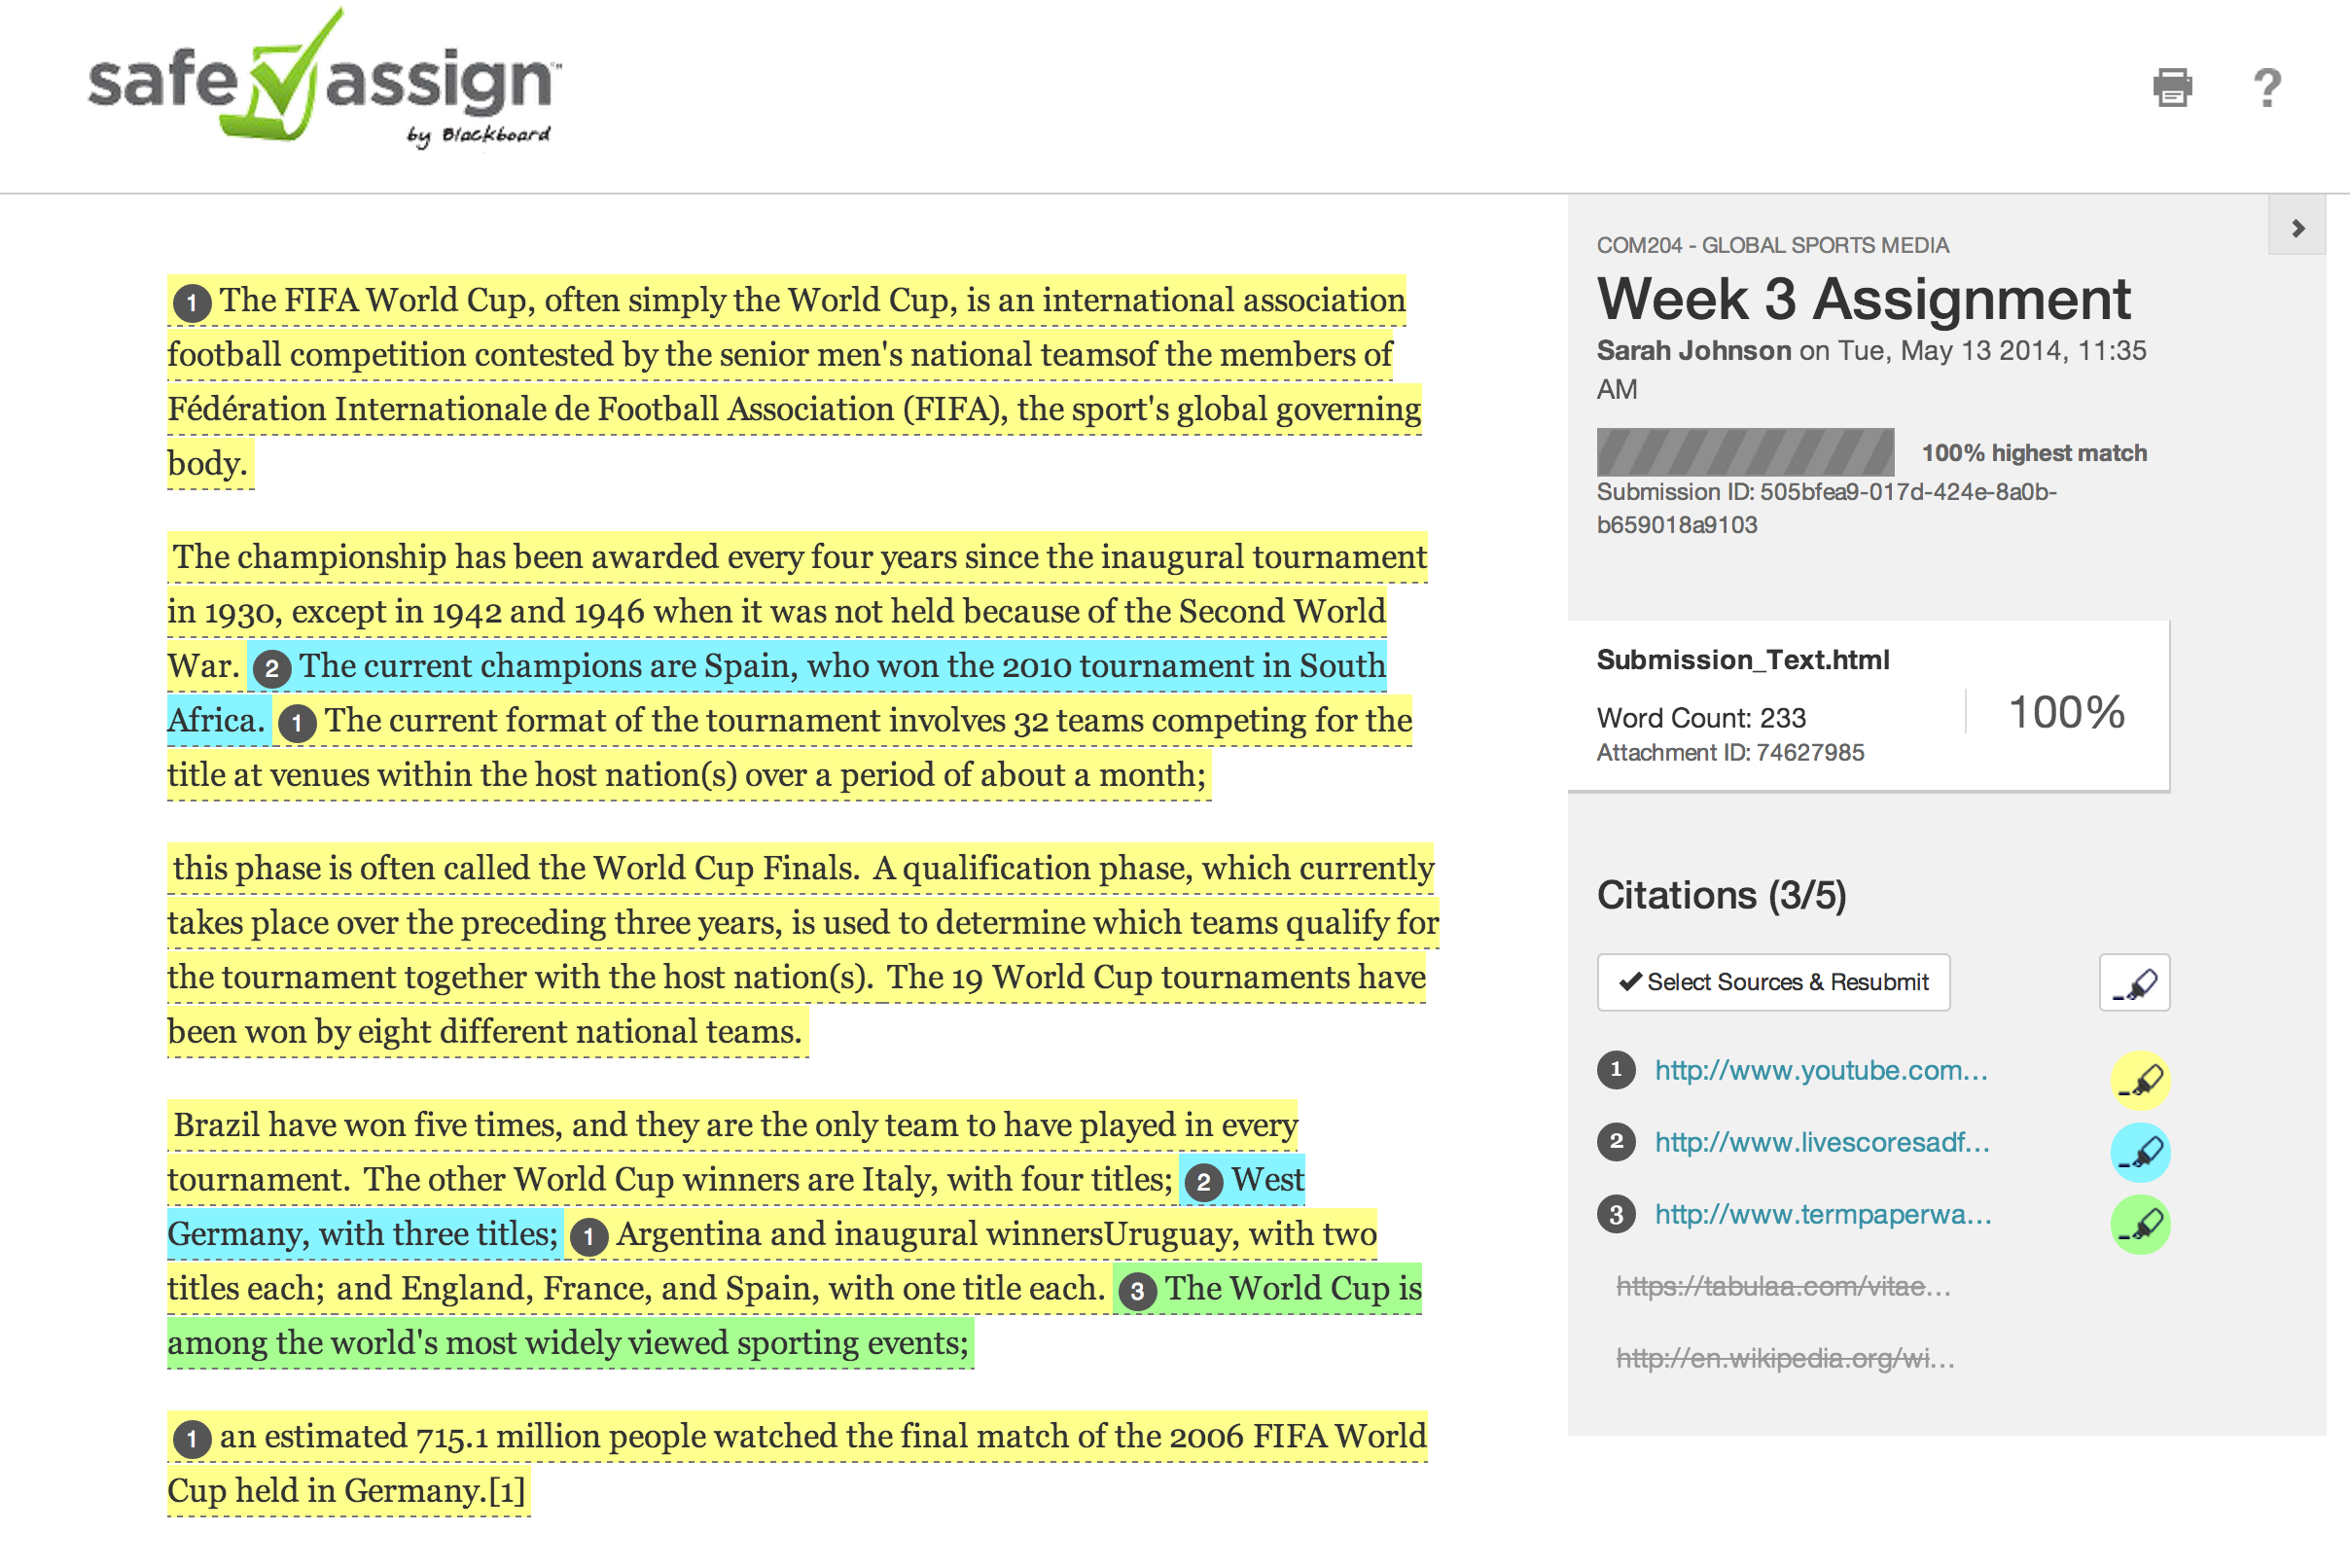 safeassign plagiarism checker